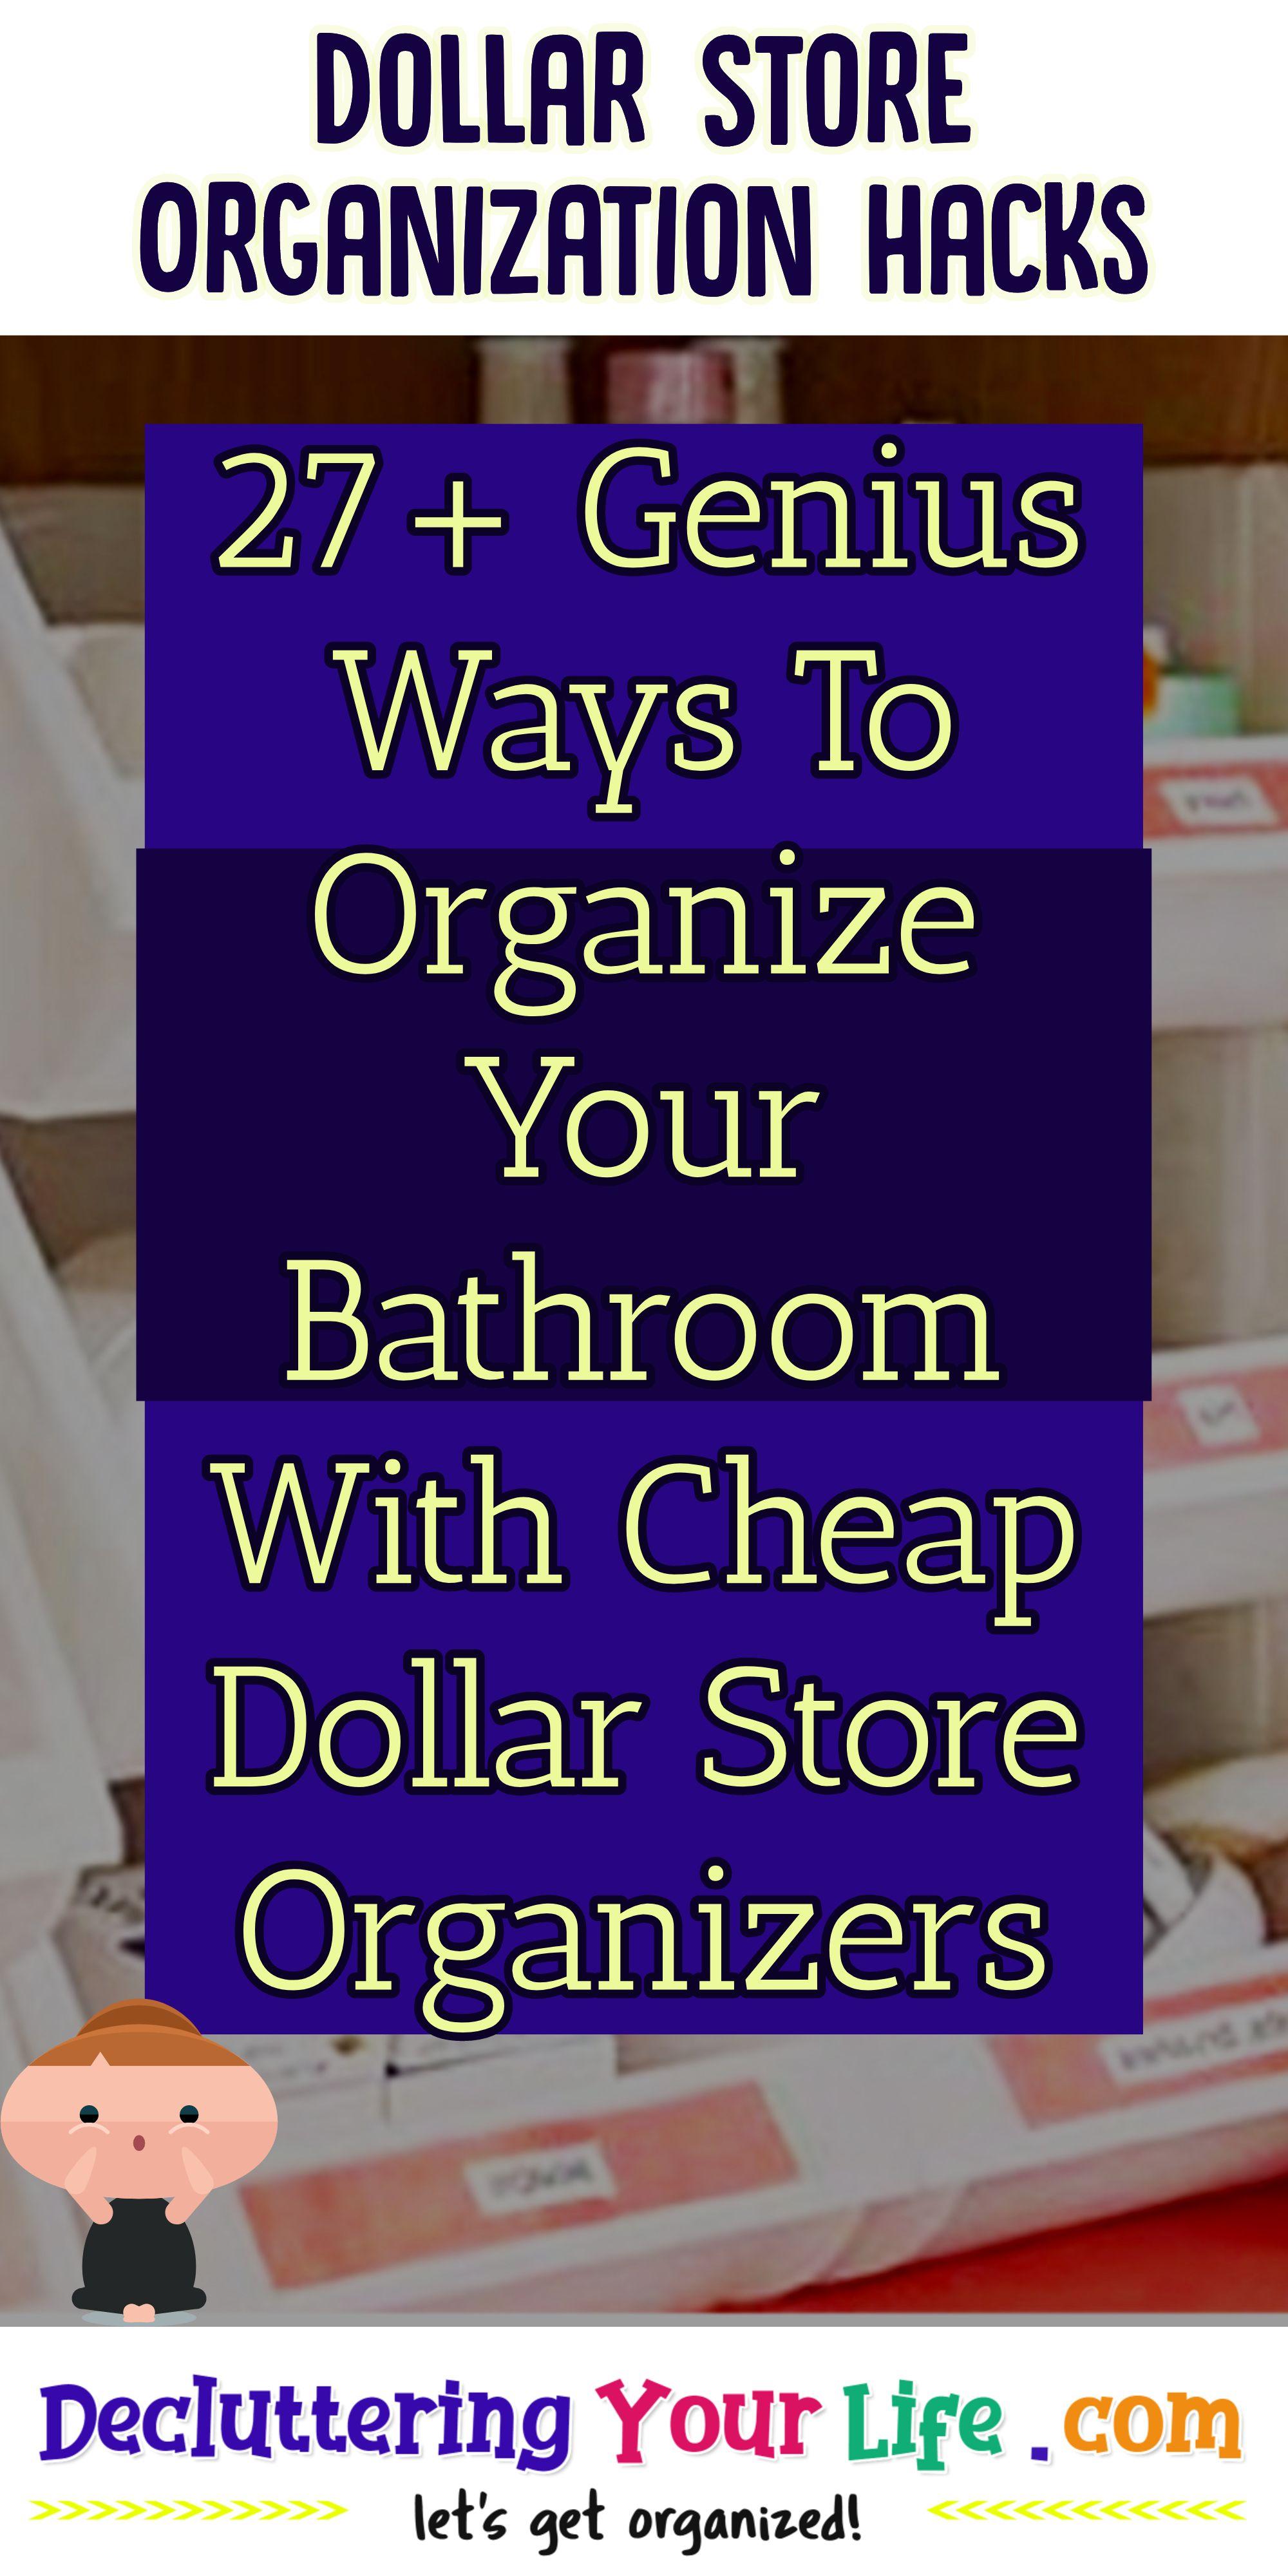 Dollar Store Organizing 27 Genius Bathroom Organization Ideas On A Budget Dollar Store Organizing Store Organization Dollar Stores